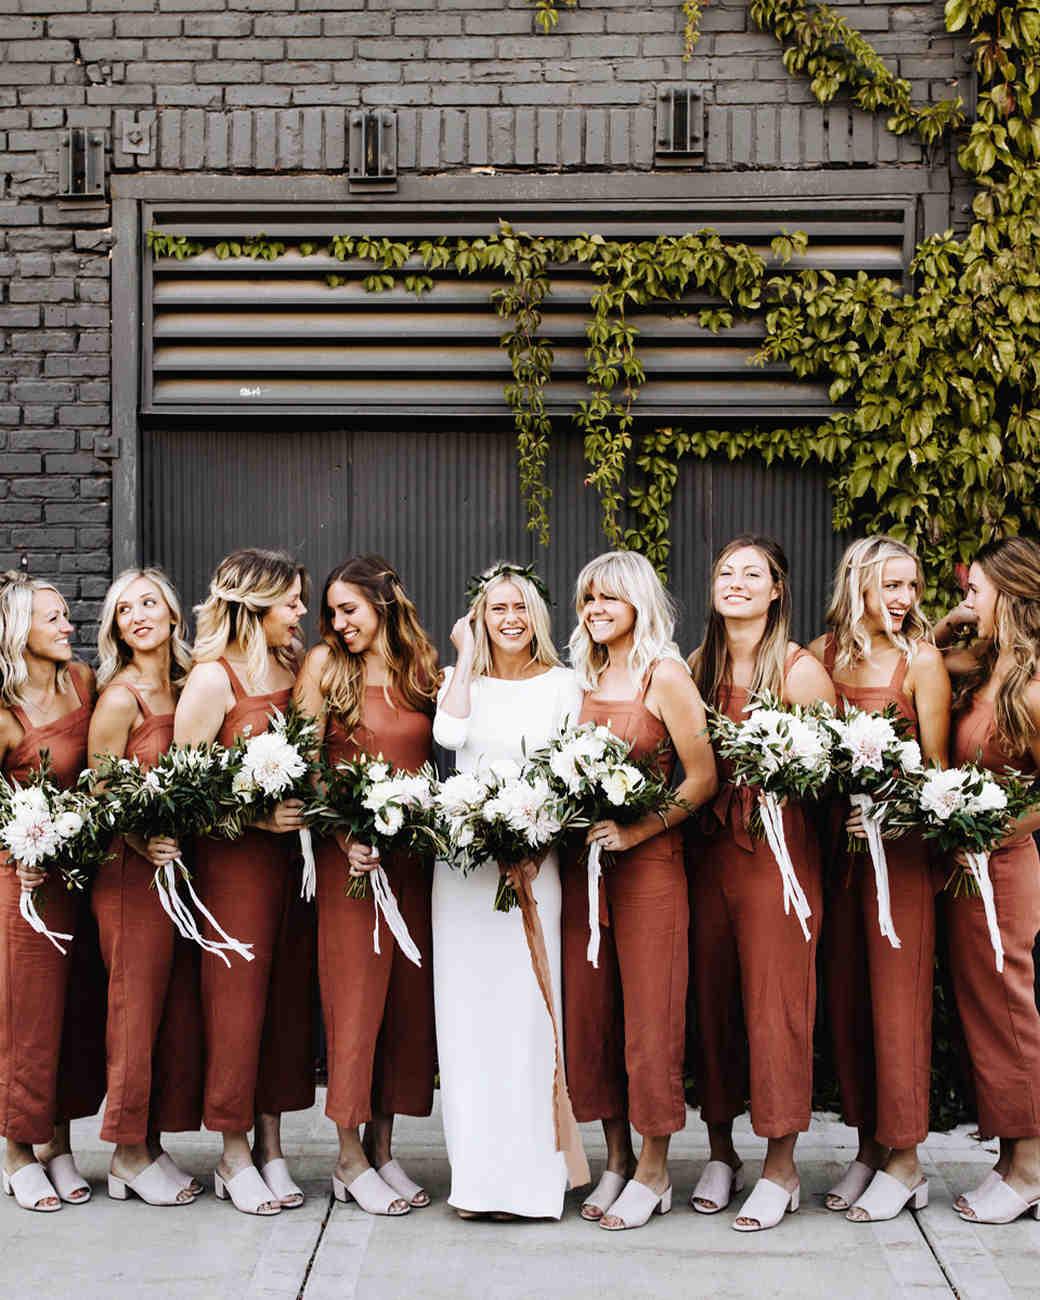 women standing in front of black brick wearing bridesmaids jumpsuits